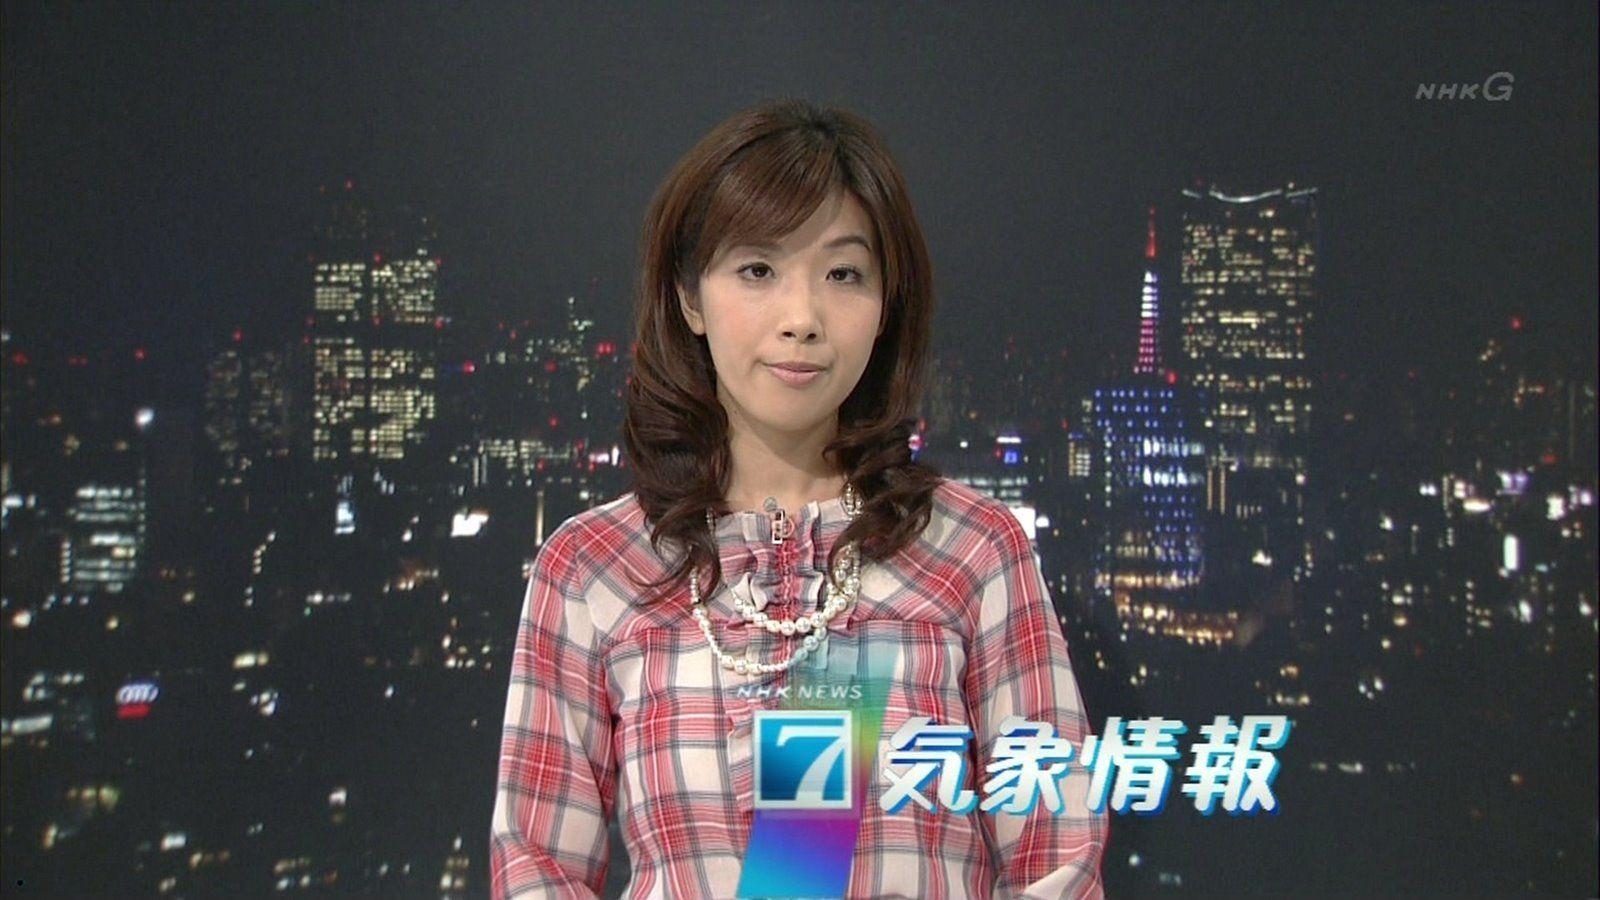 [HDTV_090327nhk_03.jpg]